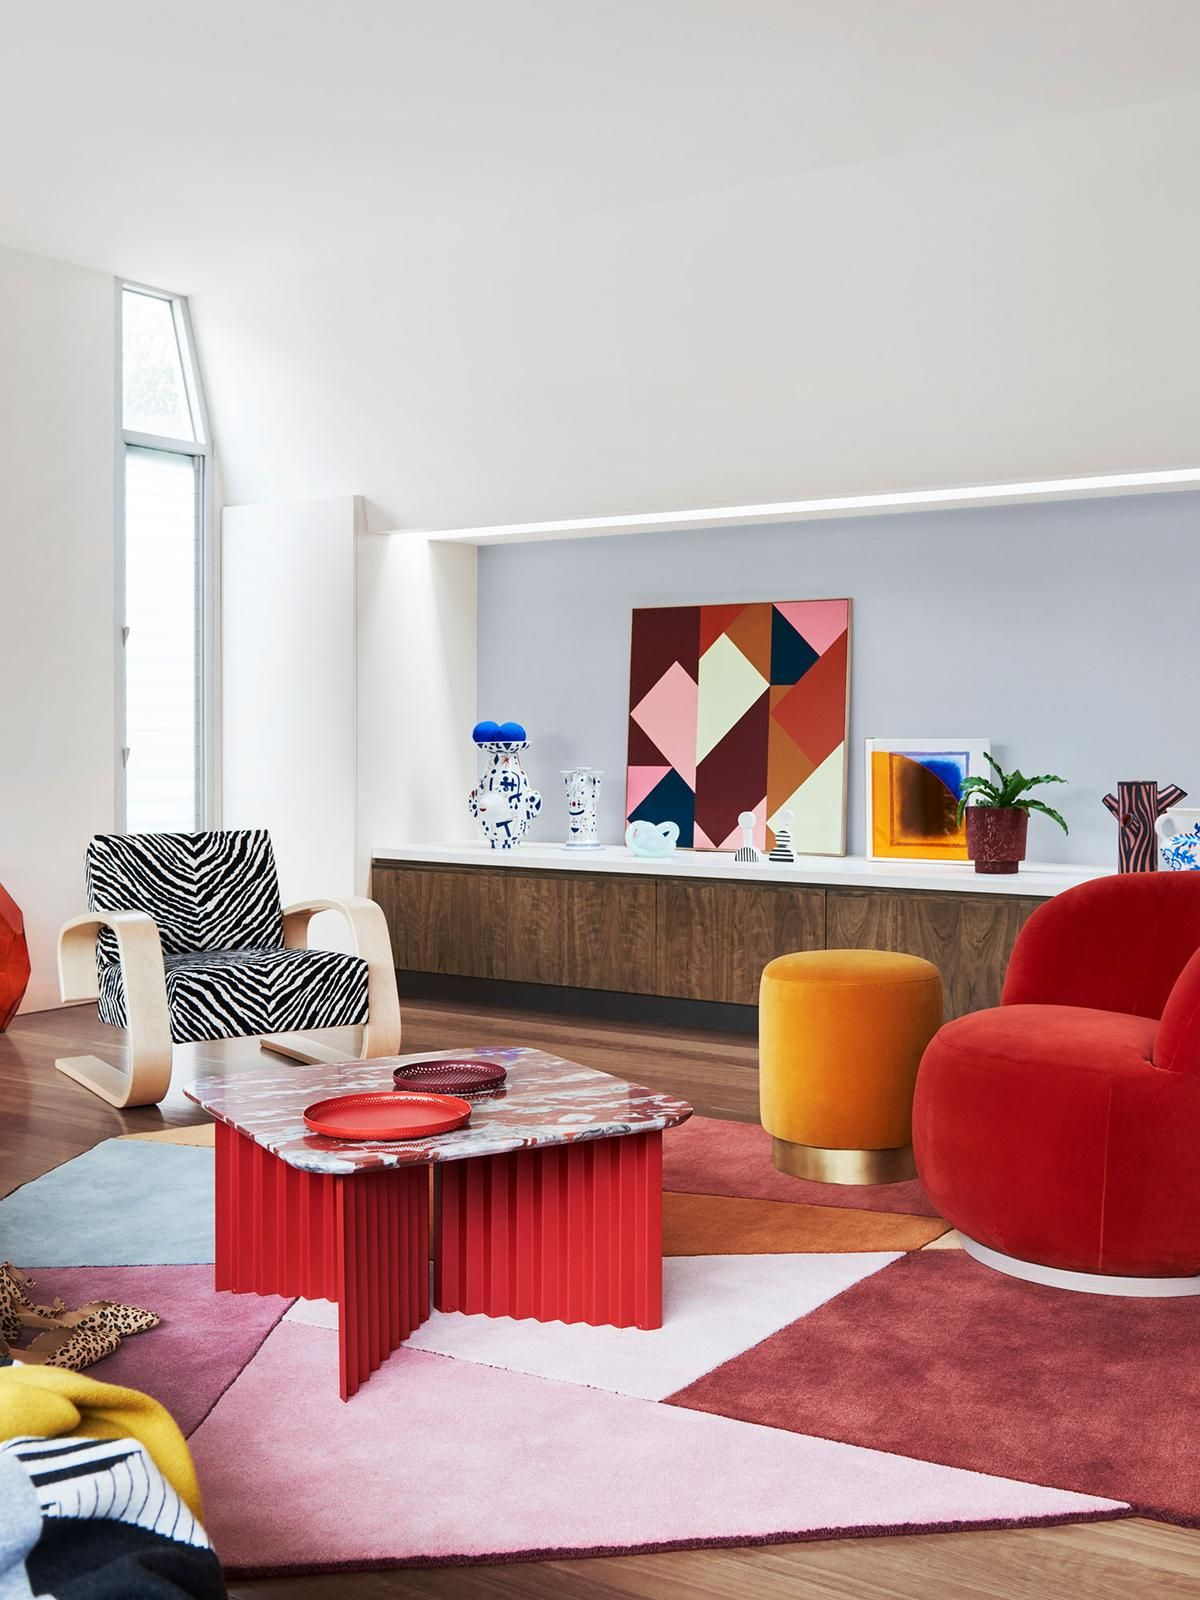 Top 4 Australian interior design trends for 2019 in 2020